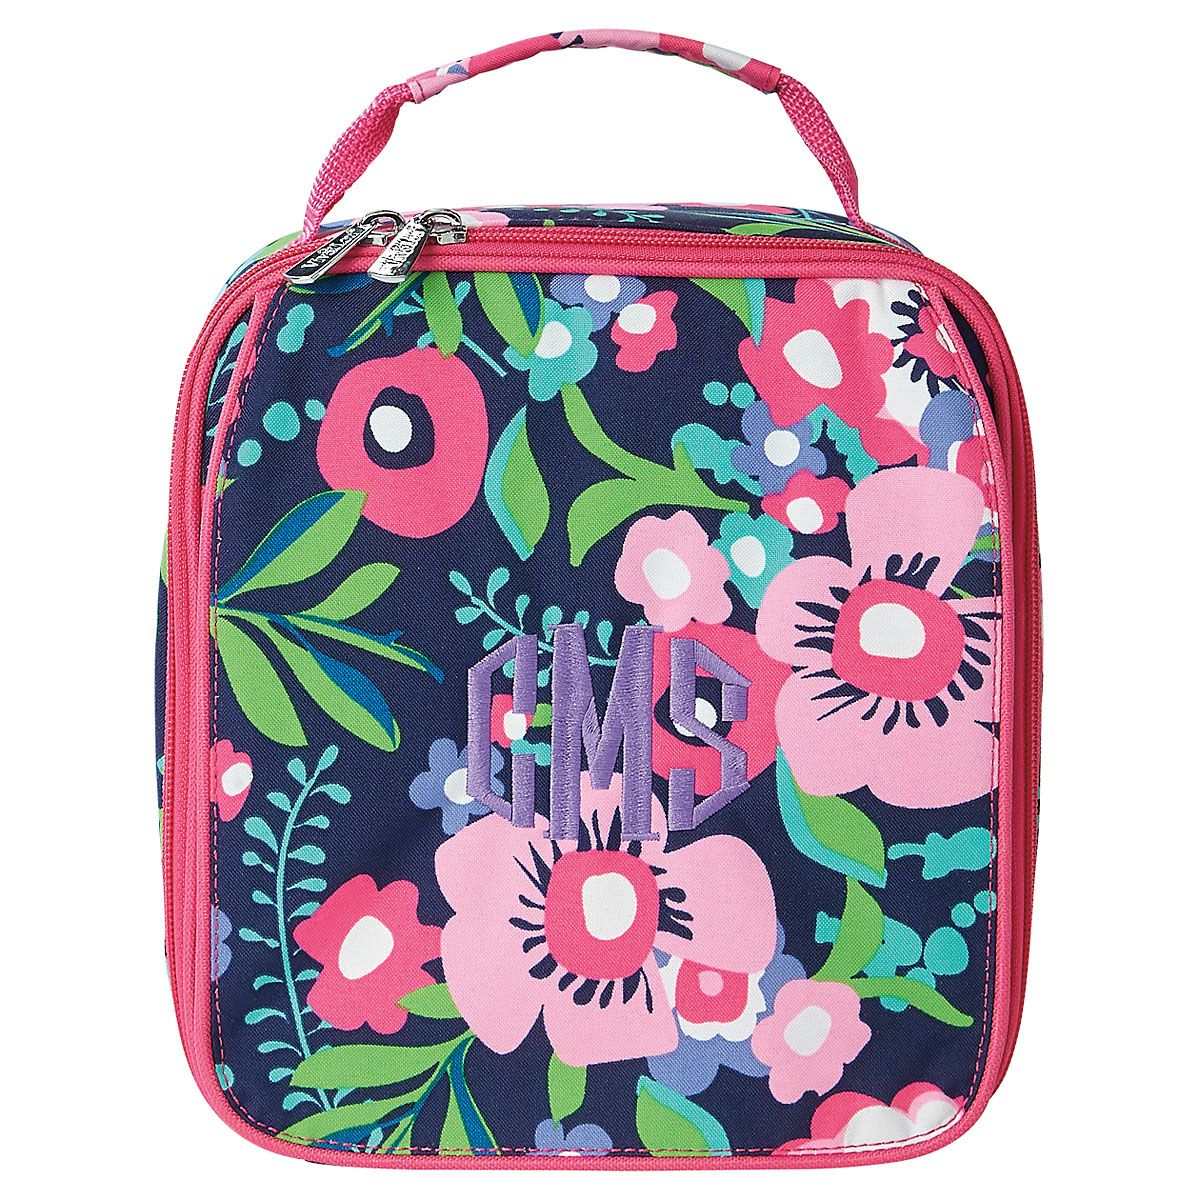 Posies Lunch Bag